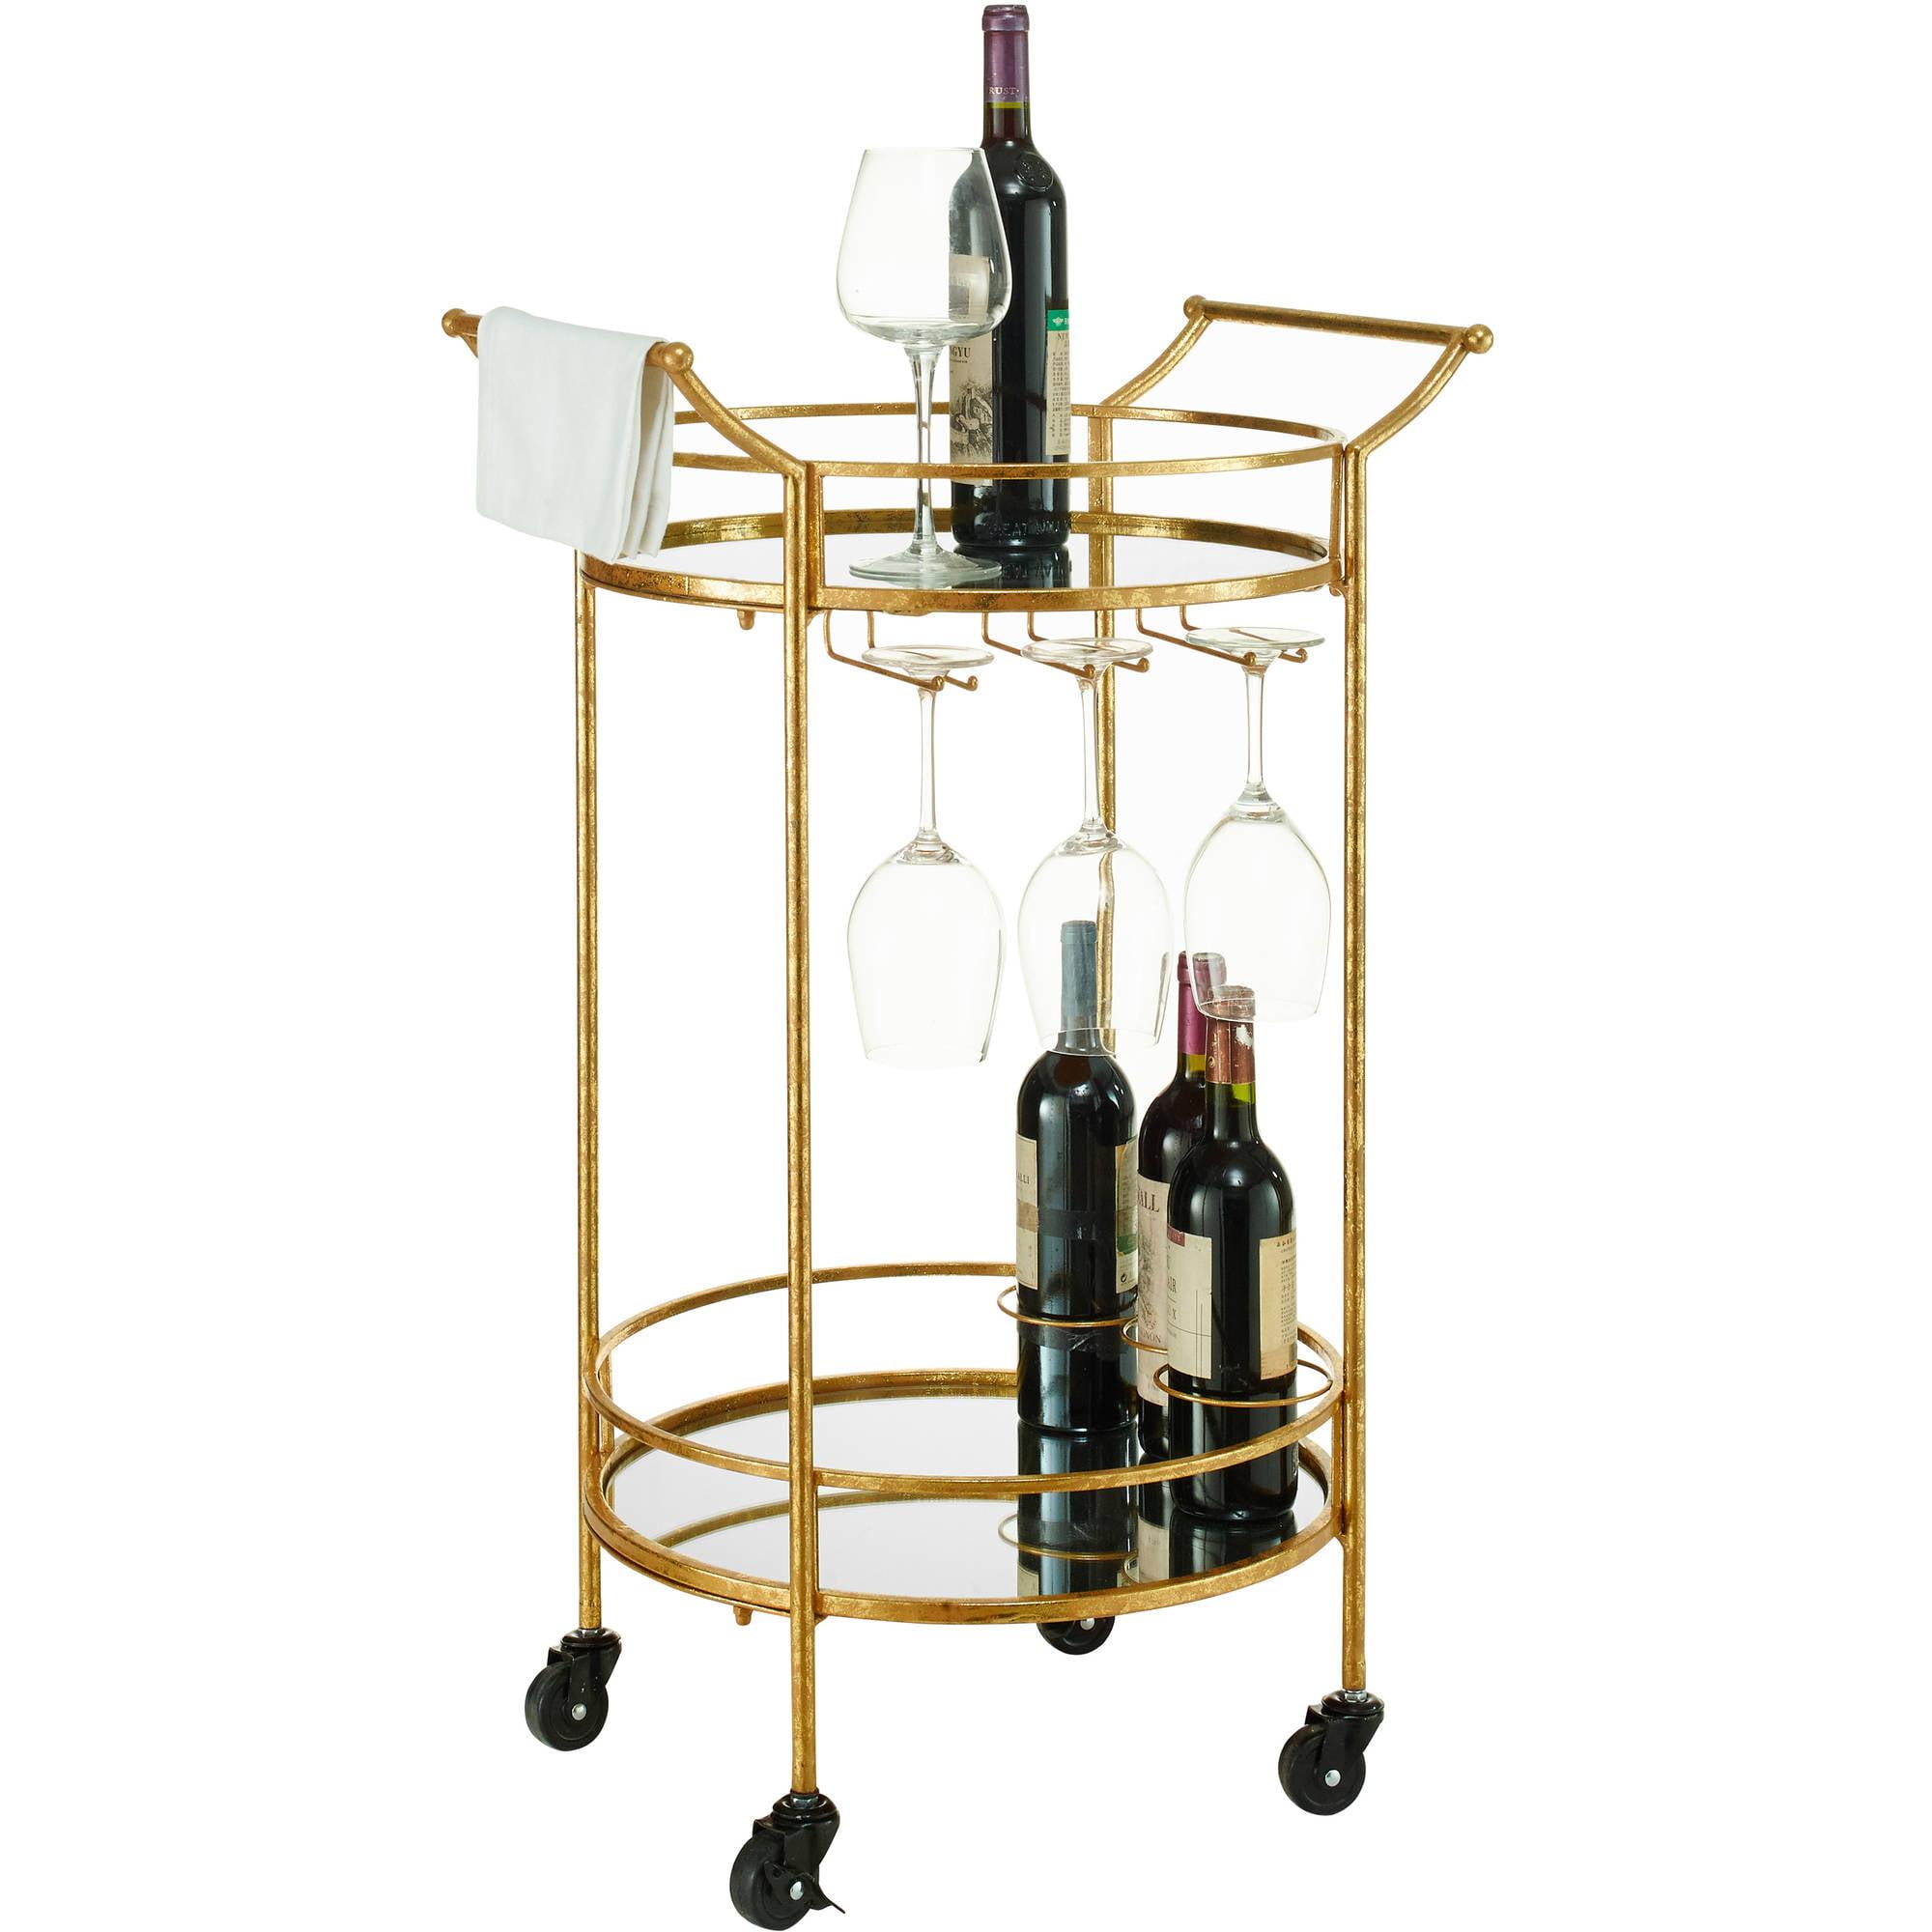 Linon Round Gold Metal Bar Cart 2 Shelves 3 Wine Holders Walmart Com Walmart Com